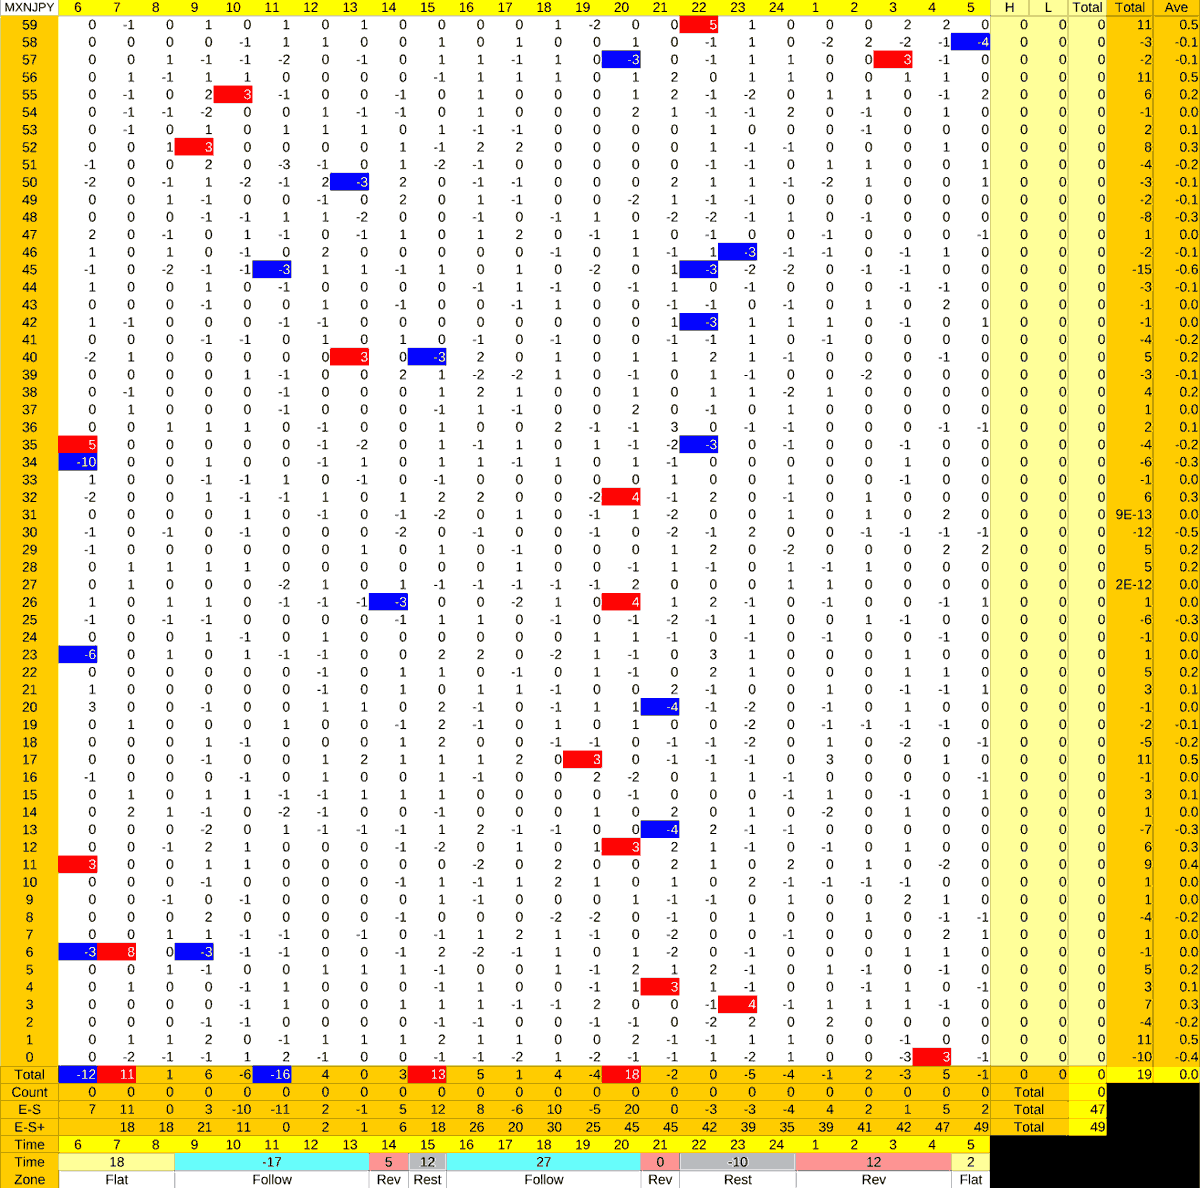 20210401_HS(3)MXNJPY